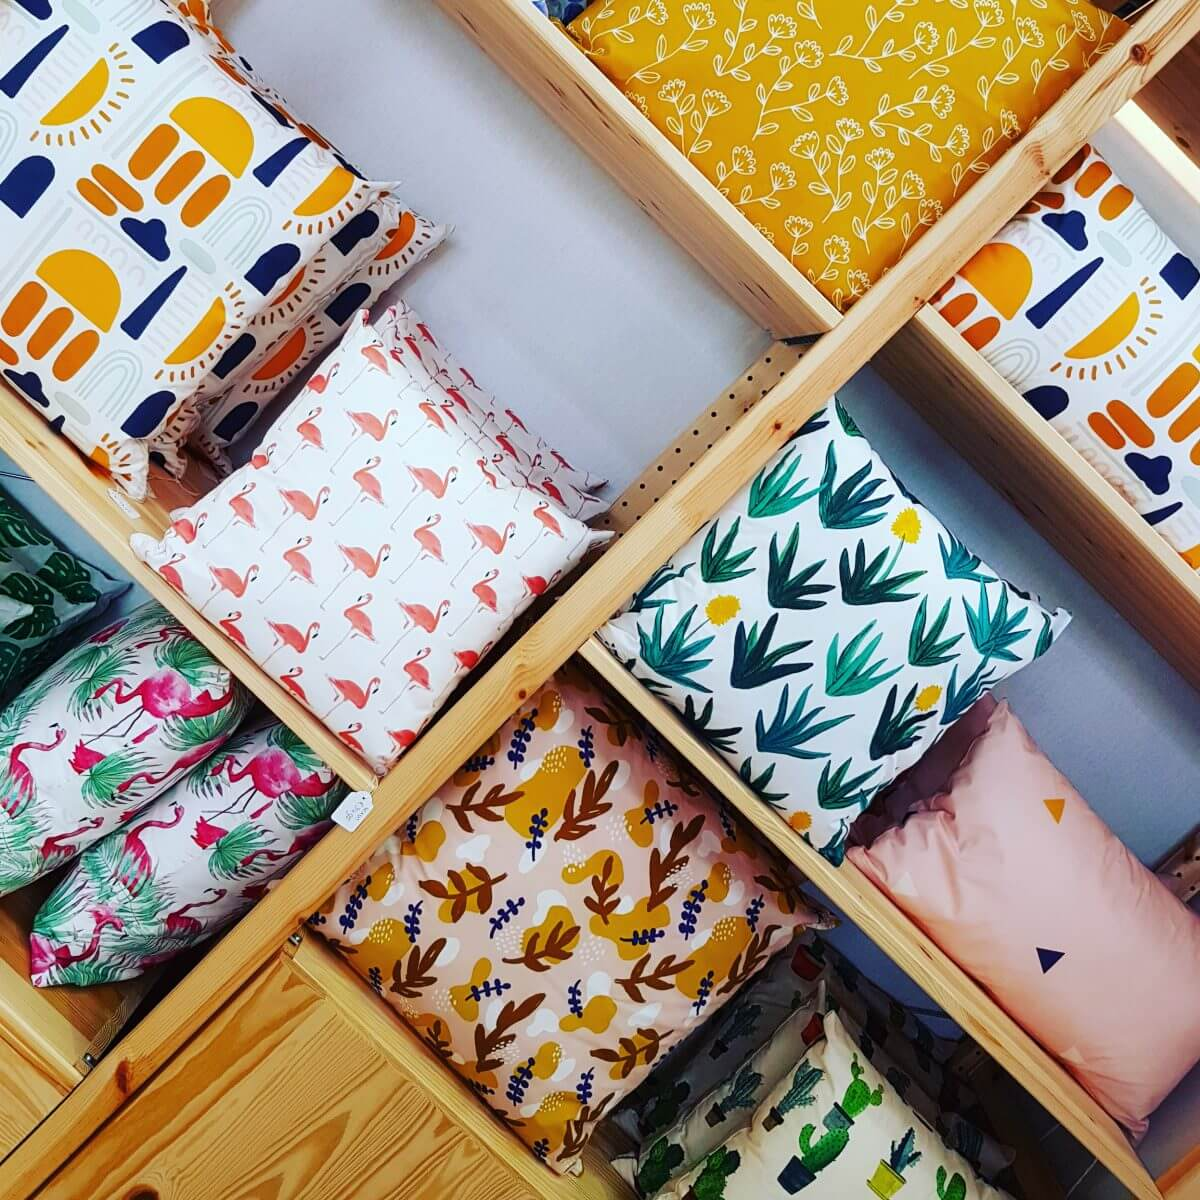 Webshop event Flavourites Live 2018: mooie prints bij We Maqe